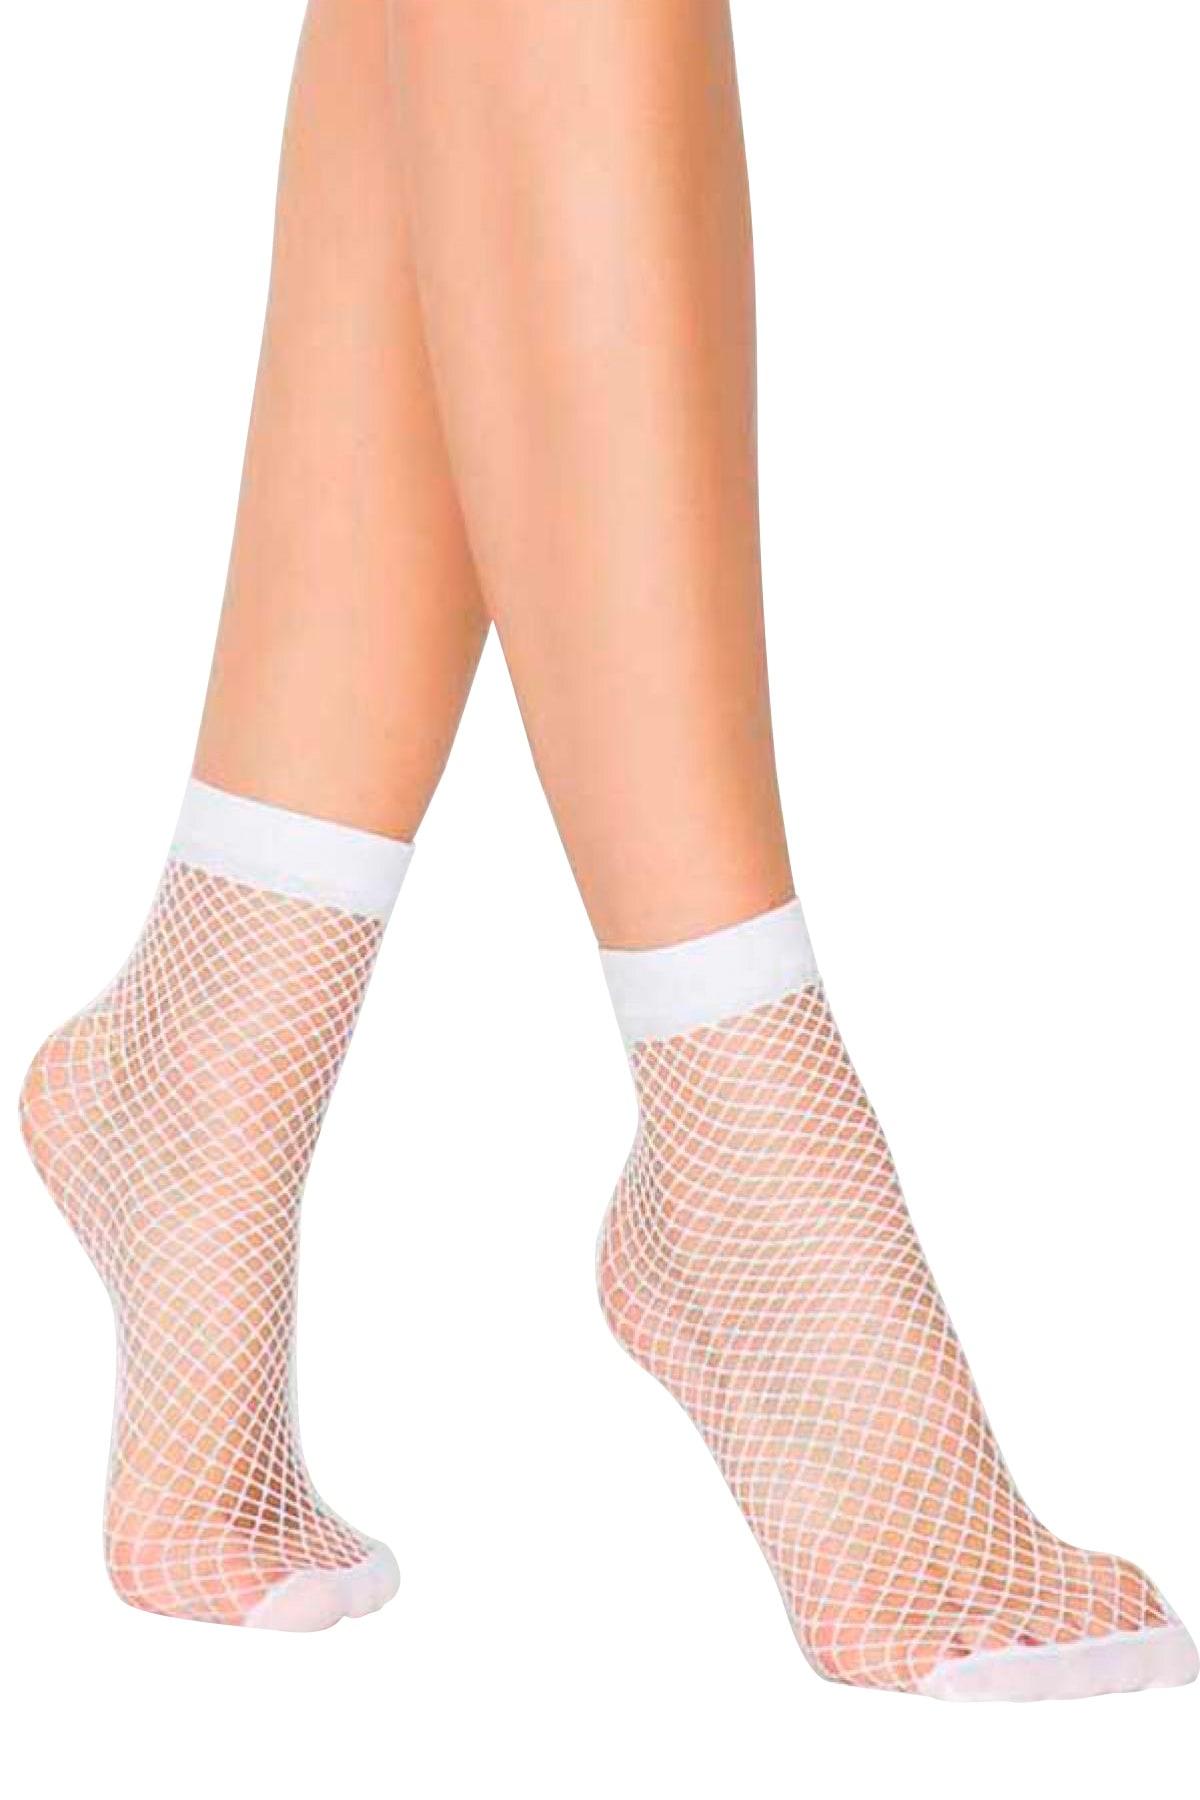 MiteLove Mite Love İri File Soket Çorap 8 Renk